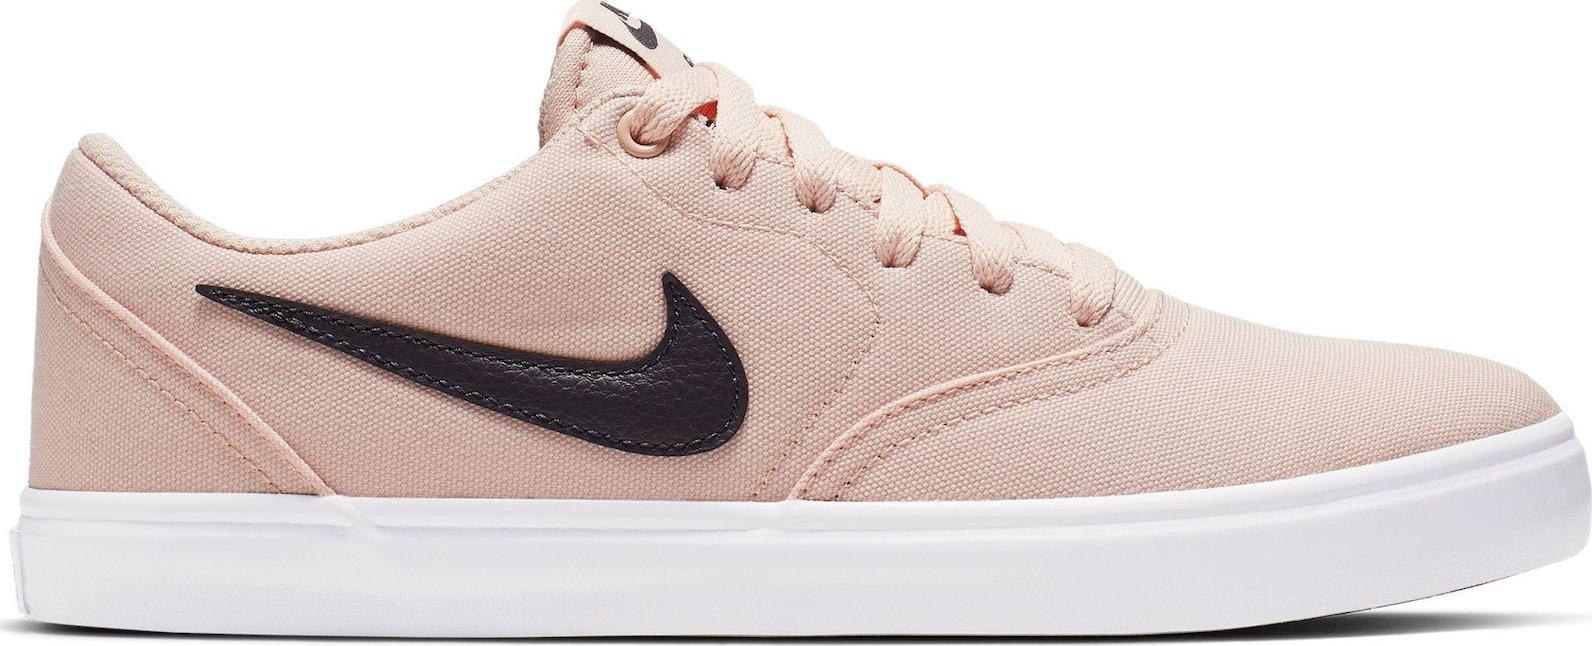 Nike obuv SB Check Solarsoft Canvas pink beige/black Velikost: 8.5